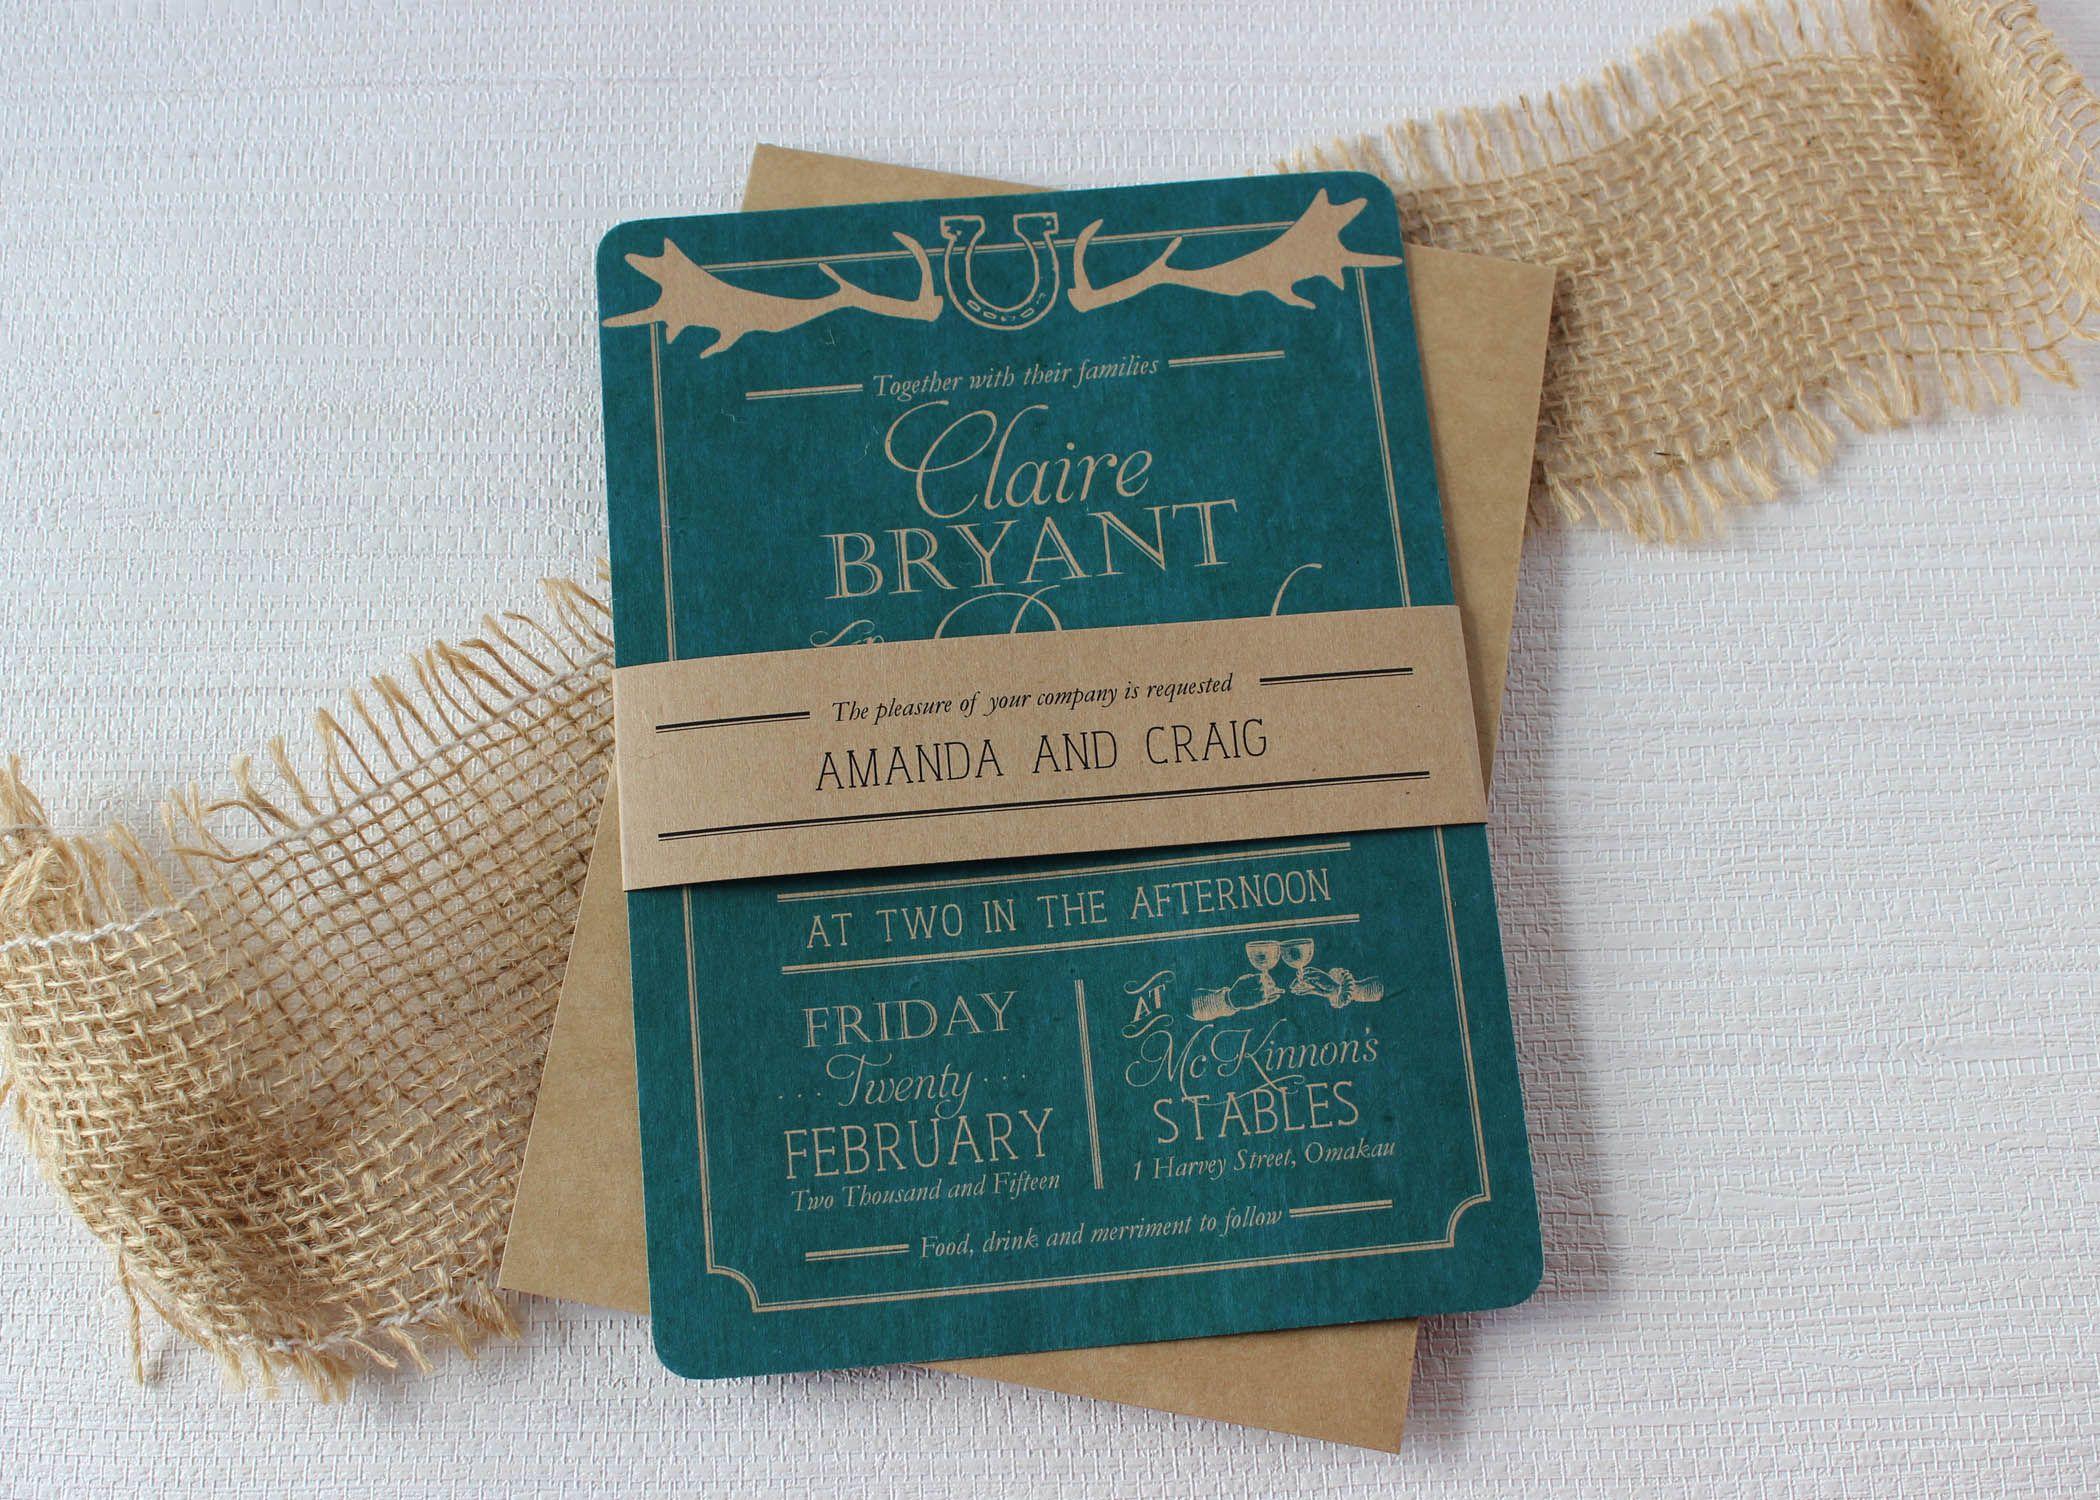 teal rustic wedding invitations - Google Search | Wedding ...